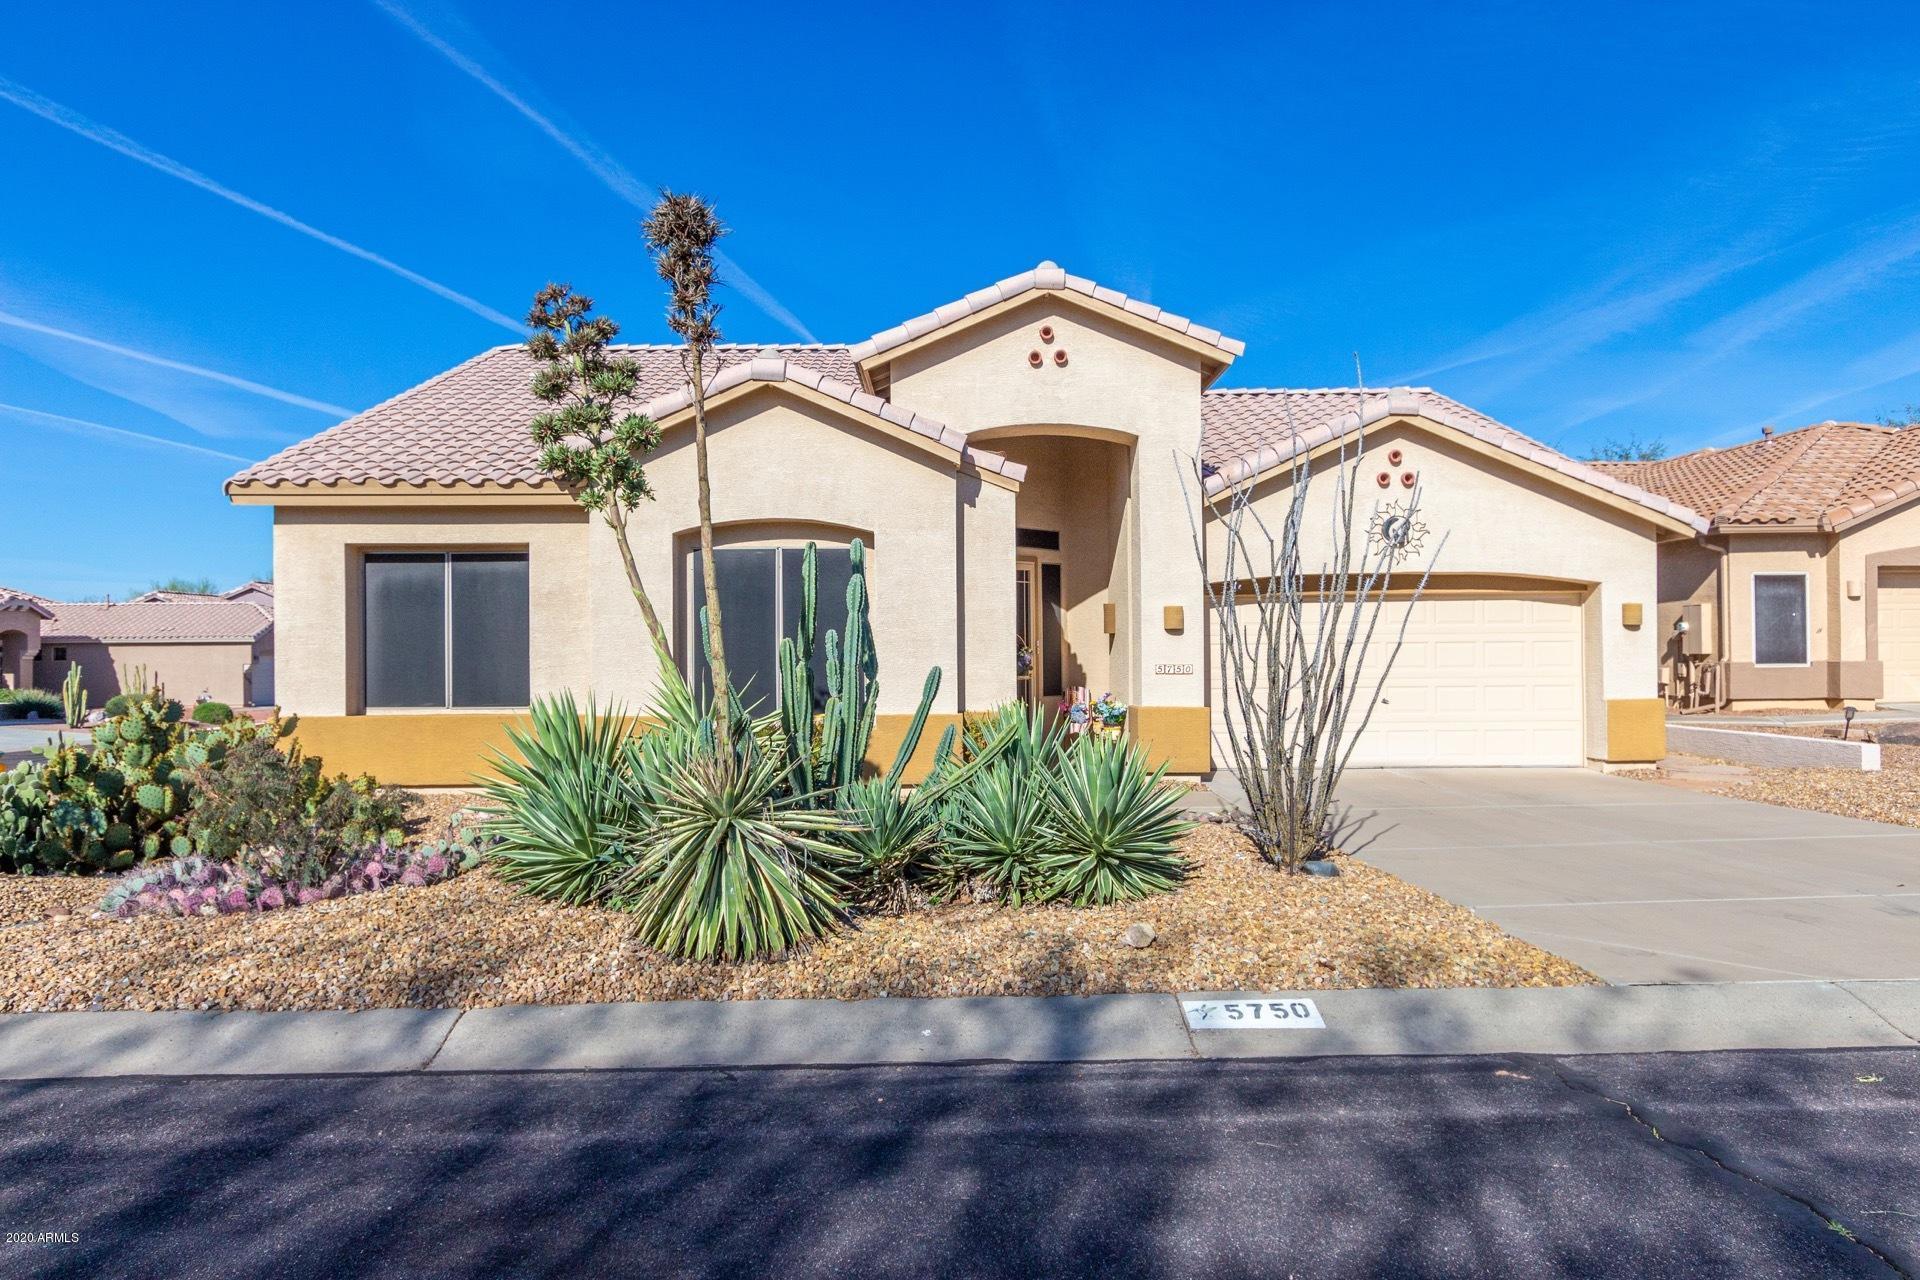 Photo of 5750 S GOLDEN BARREL Court, Gold Canyon, AZ 85118